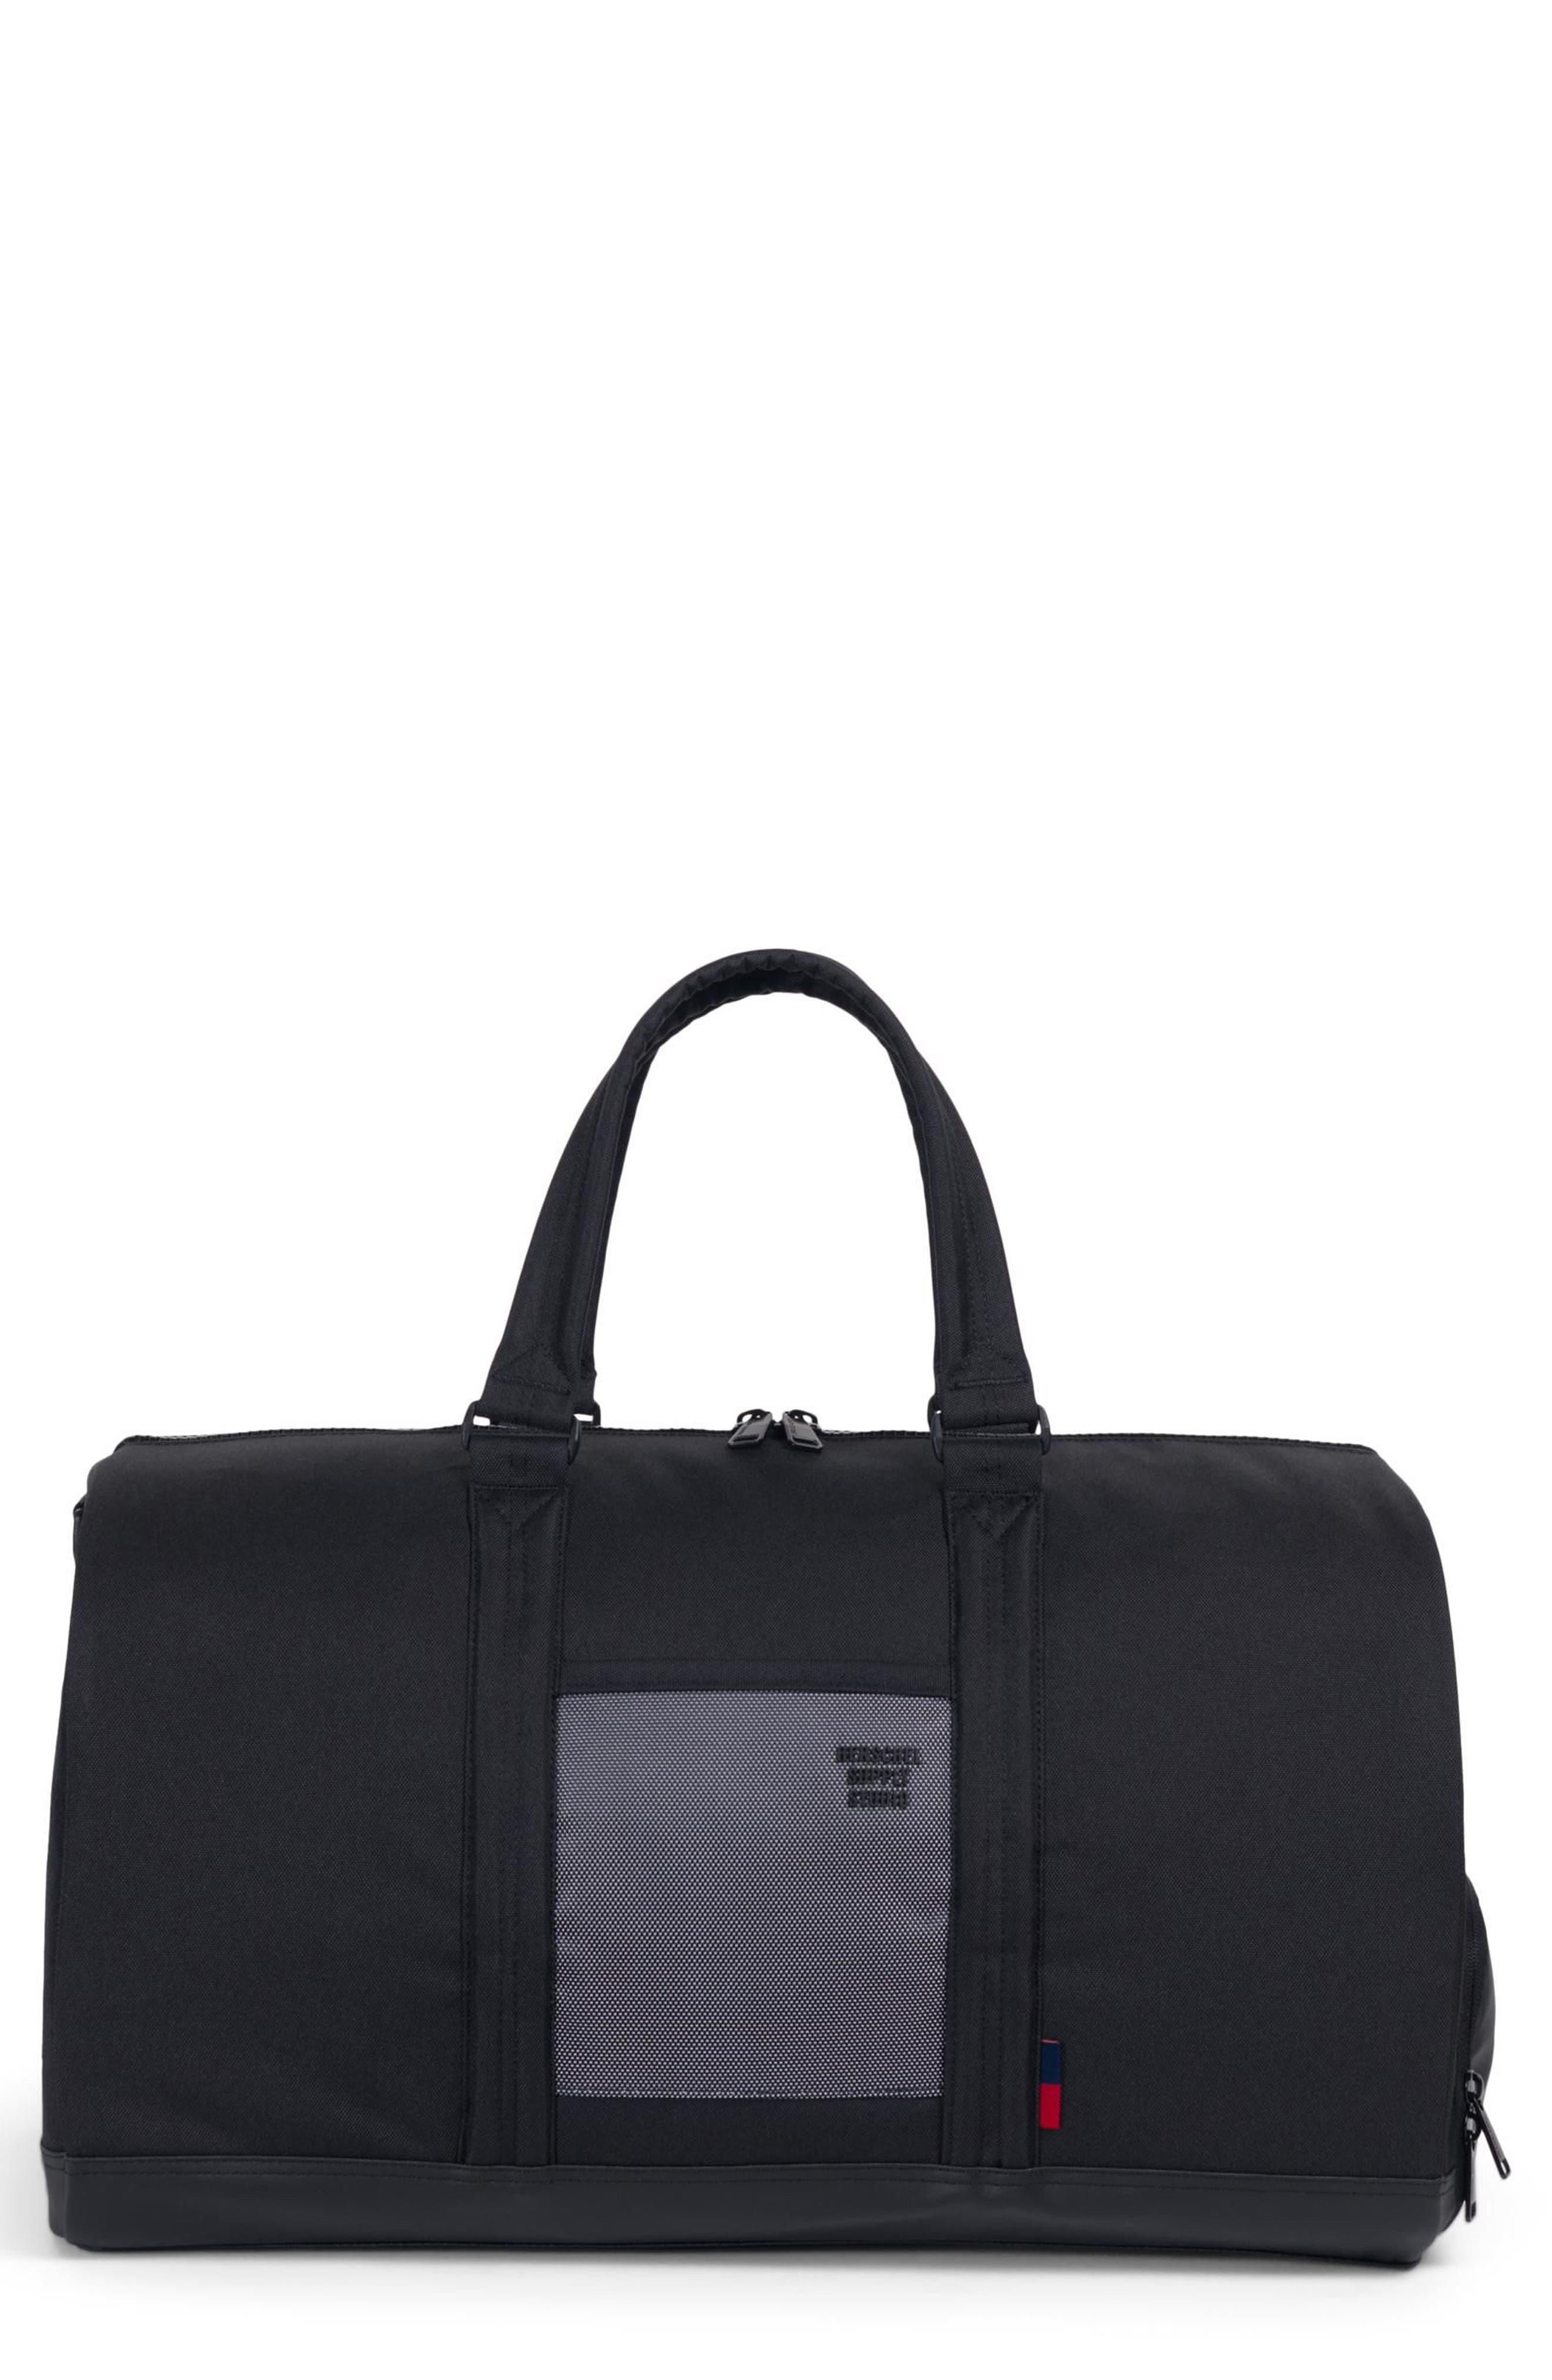 Novel Studio Duffel Bag,                         Main,                         color, BLACK